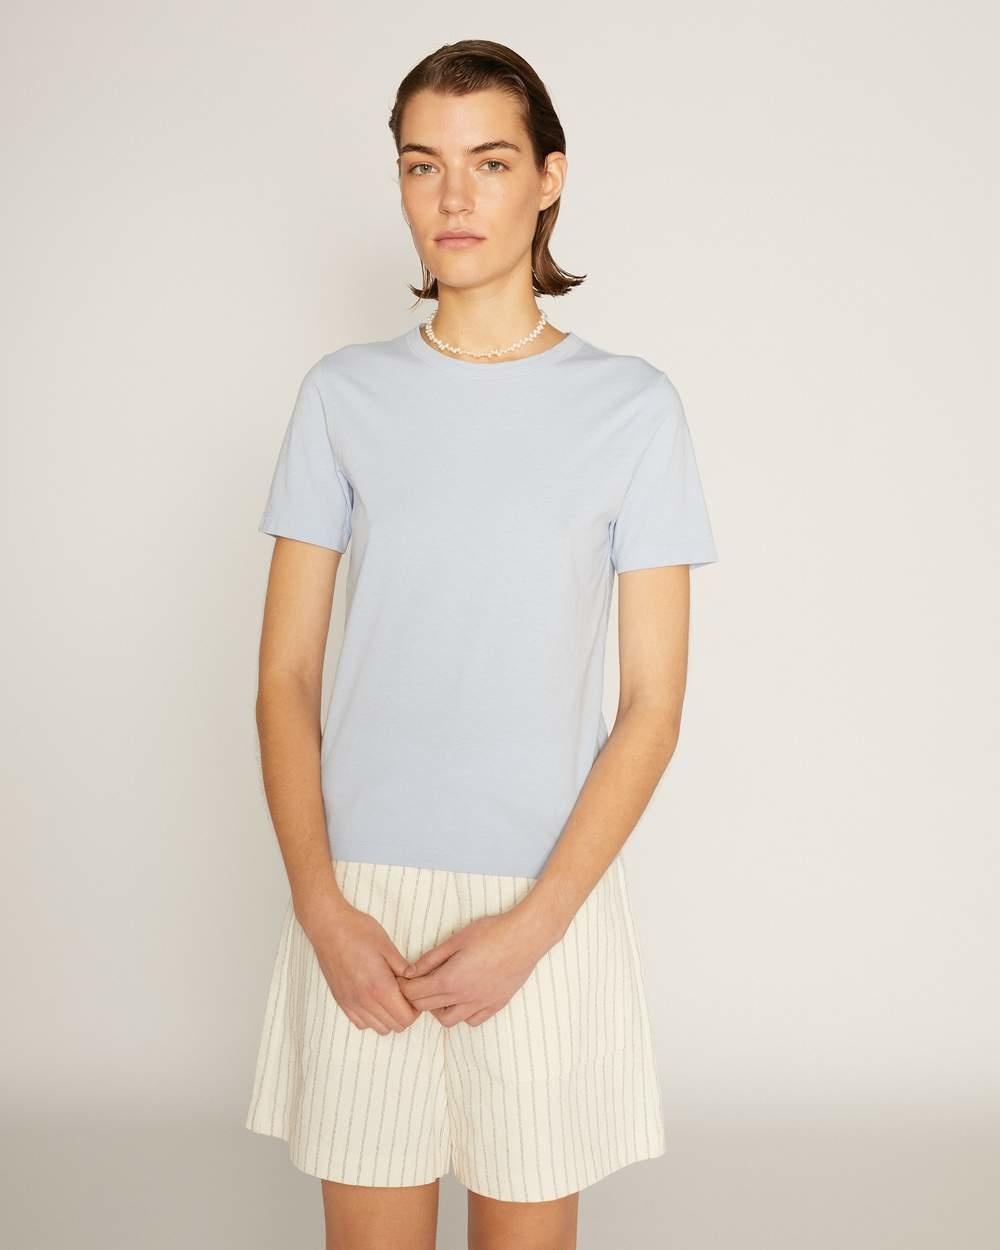 Organic MC T-shirt Sky Blue